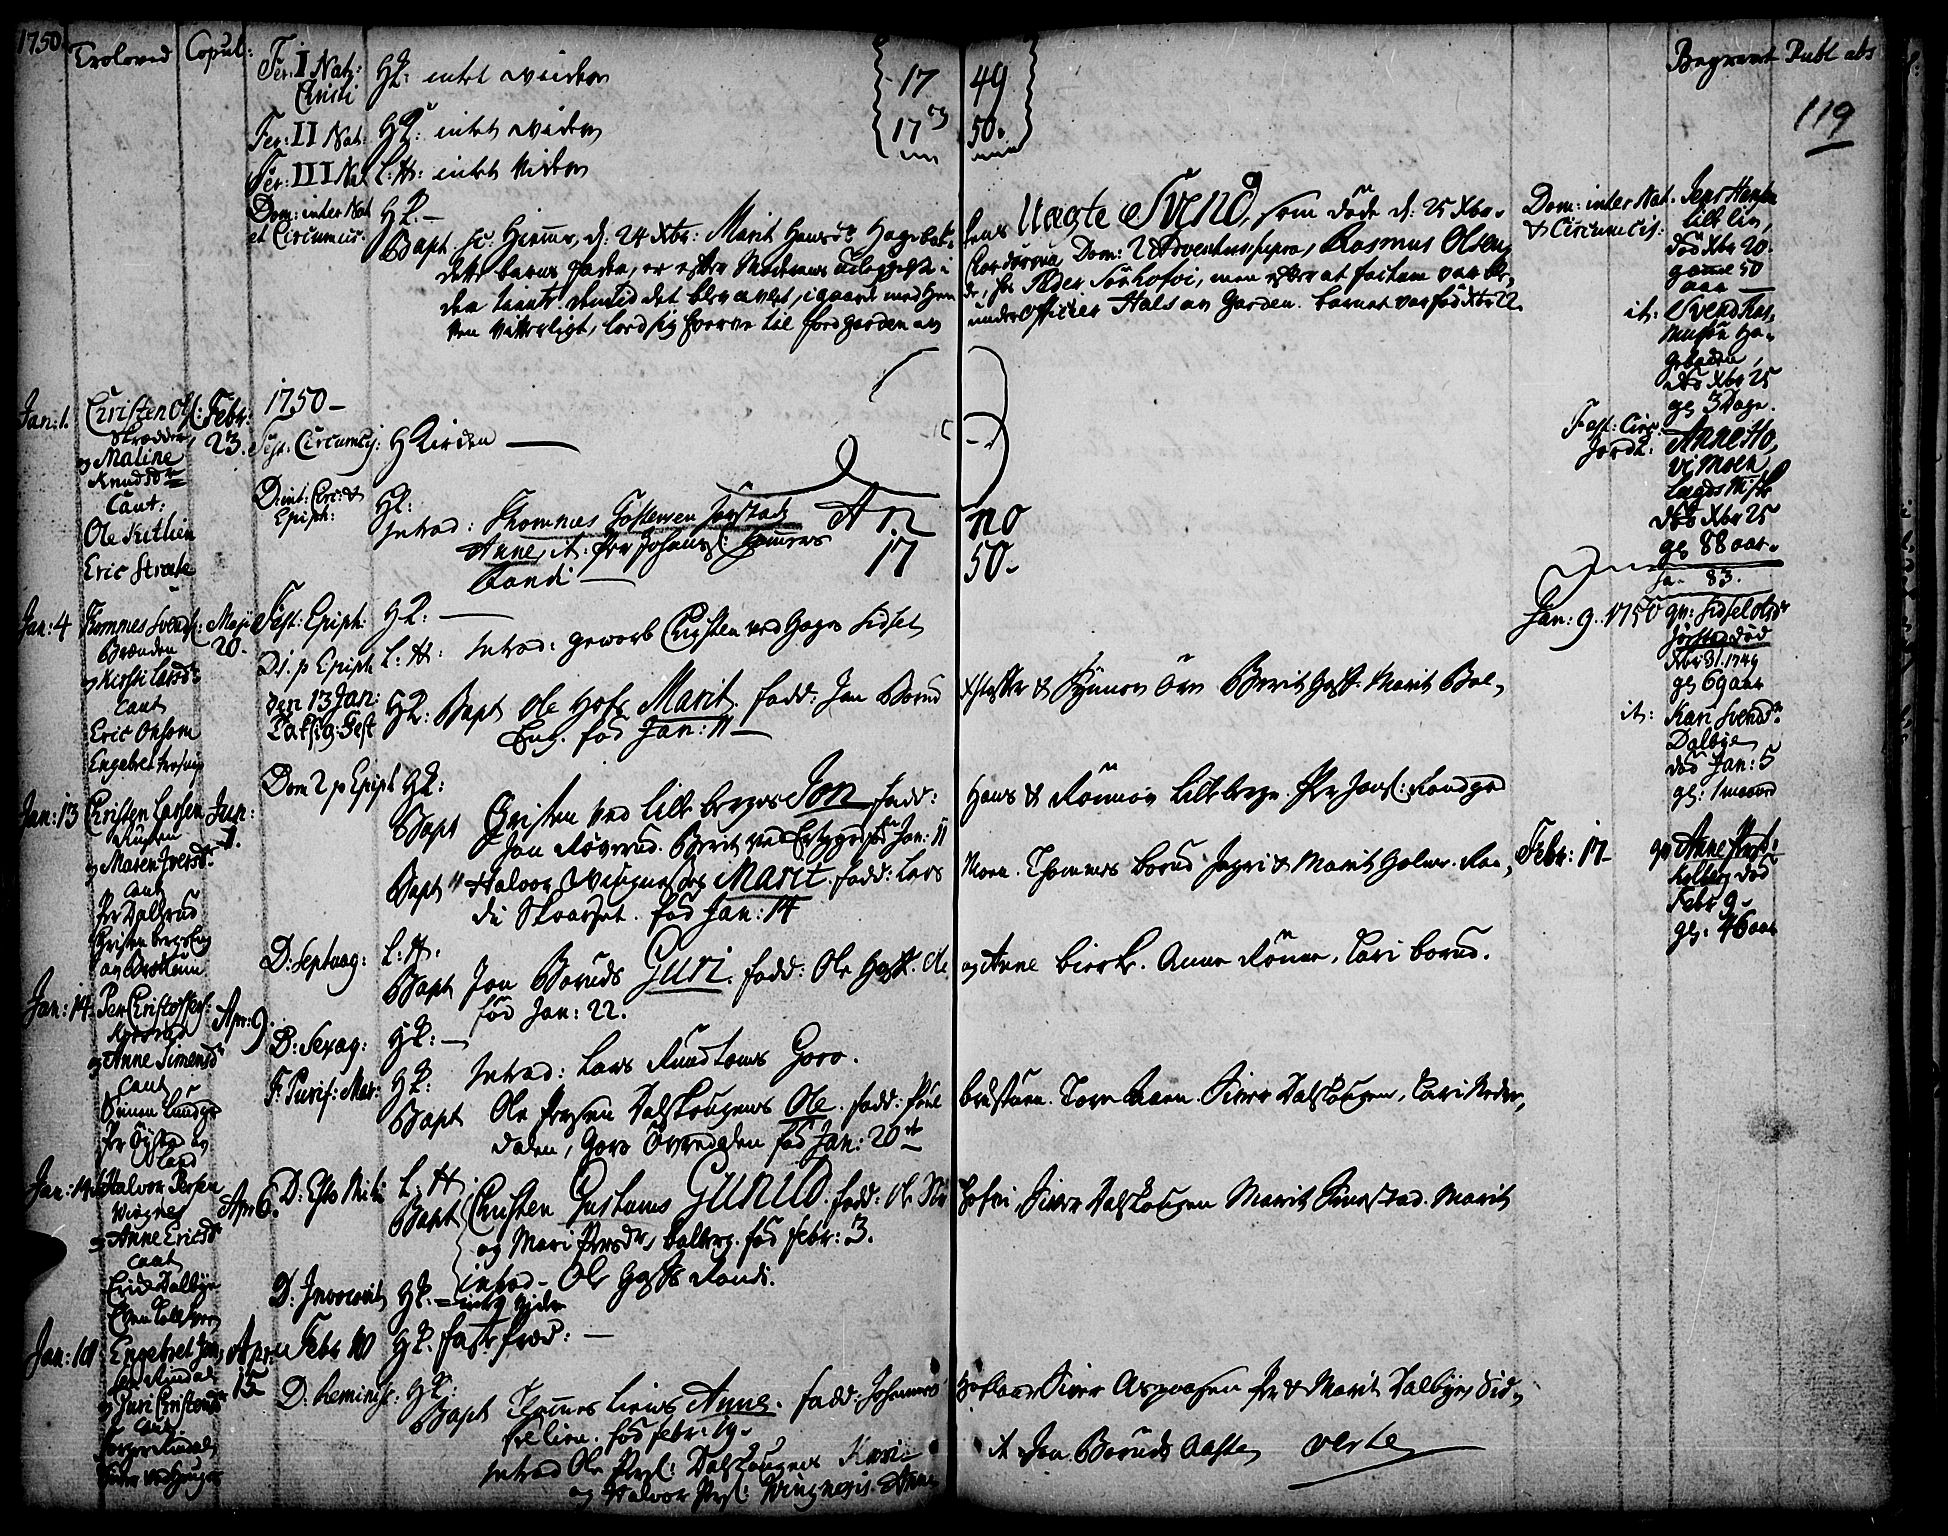 SAH, Fåberg prestekontor, Ministerialbok nr. 1, 1727-1775, s. 119